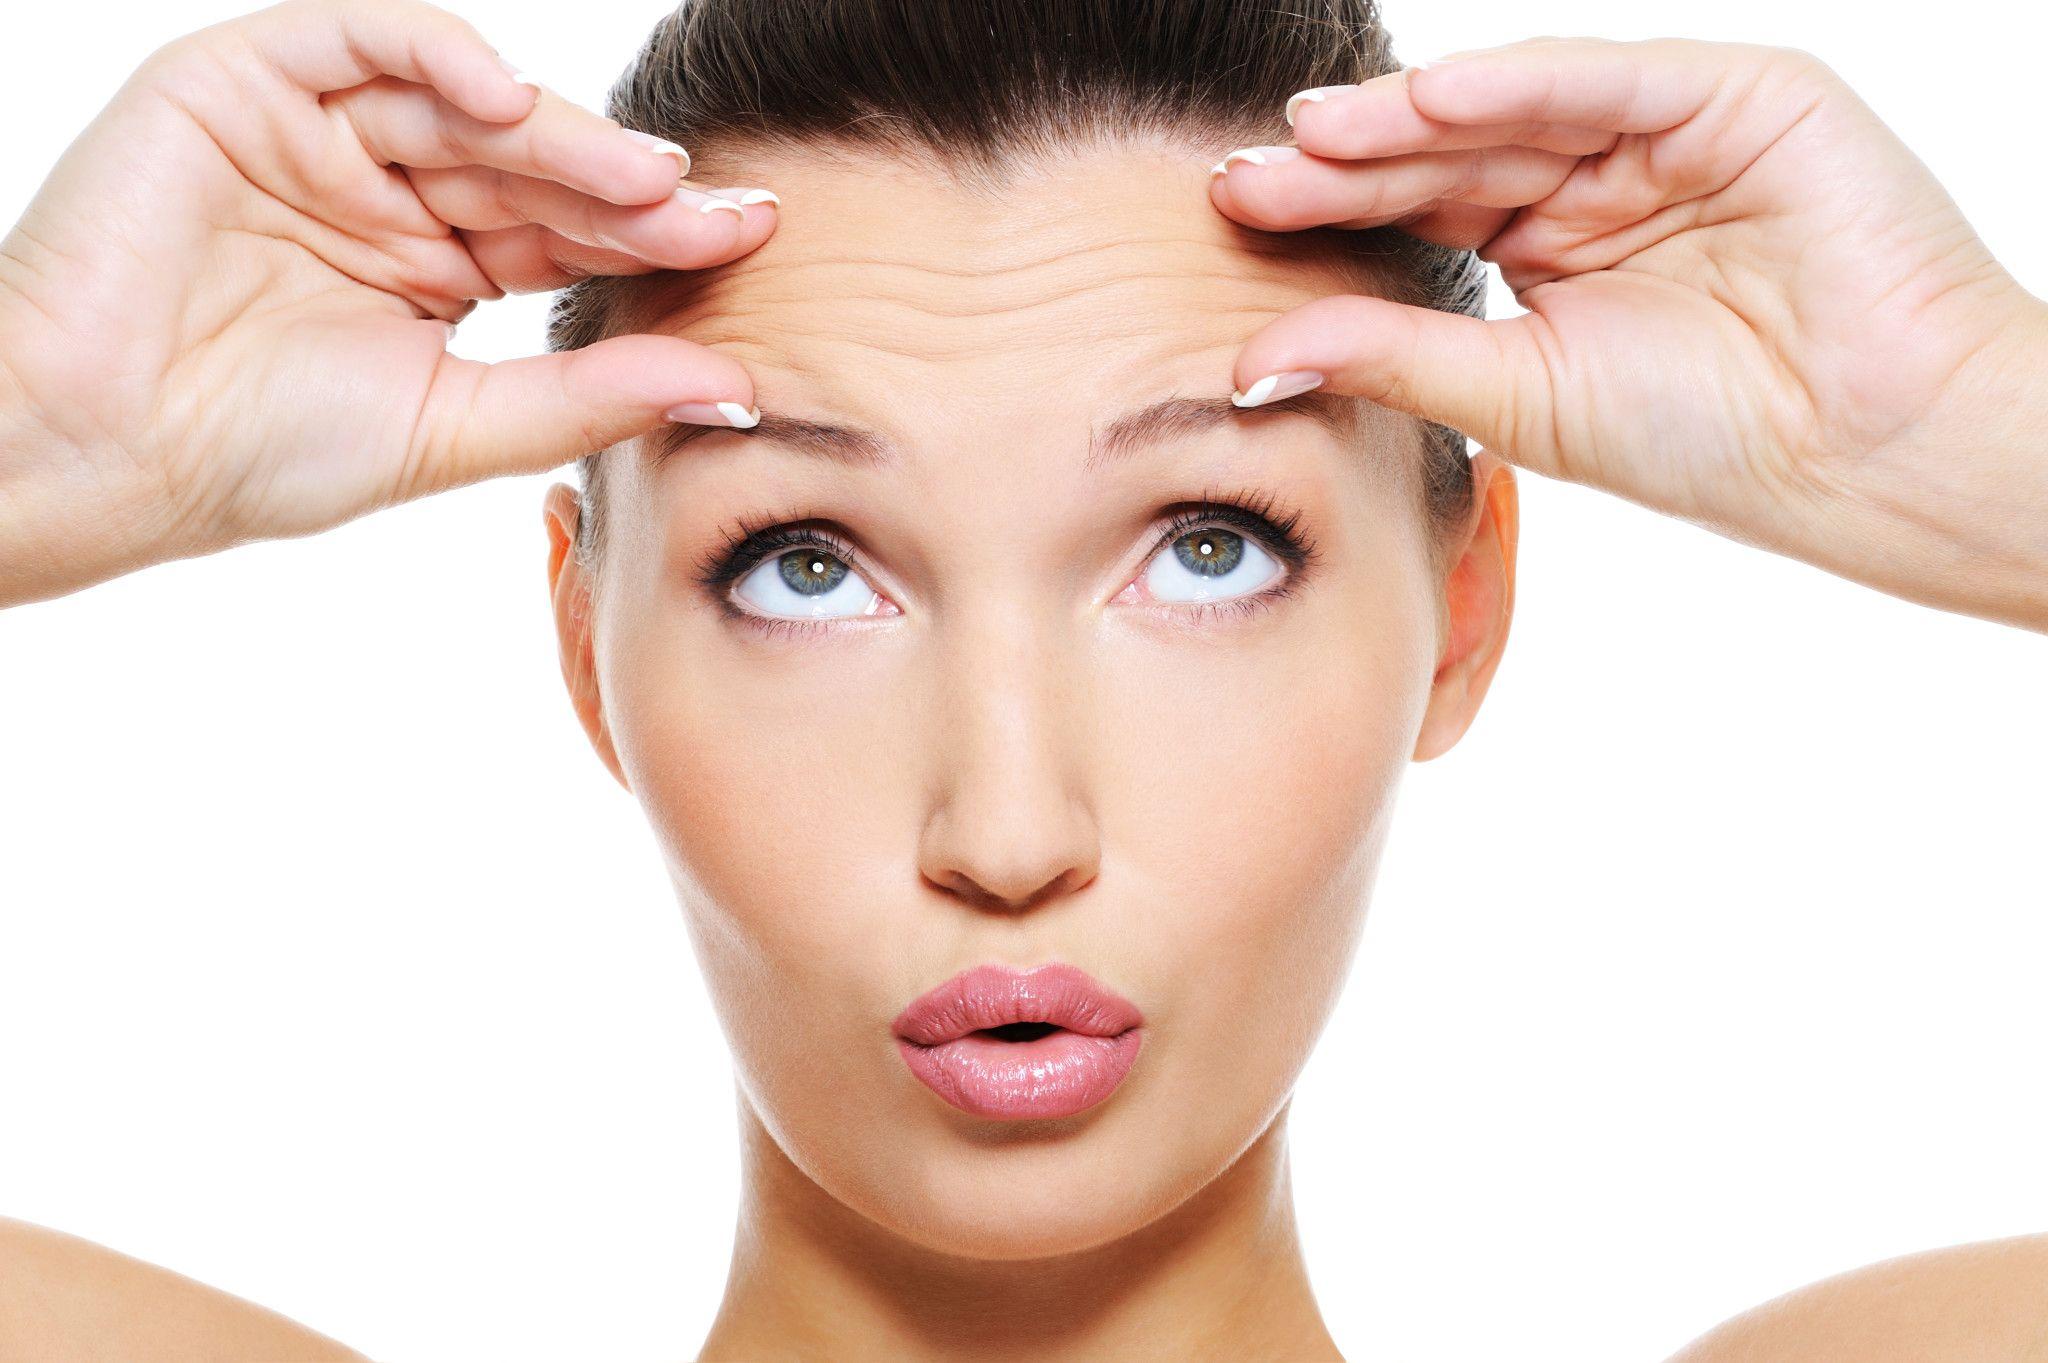 Women before eyebrows tattoo